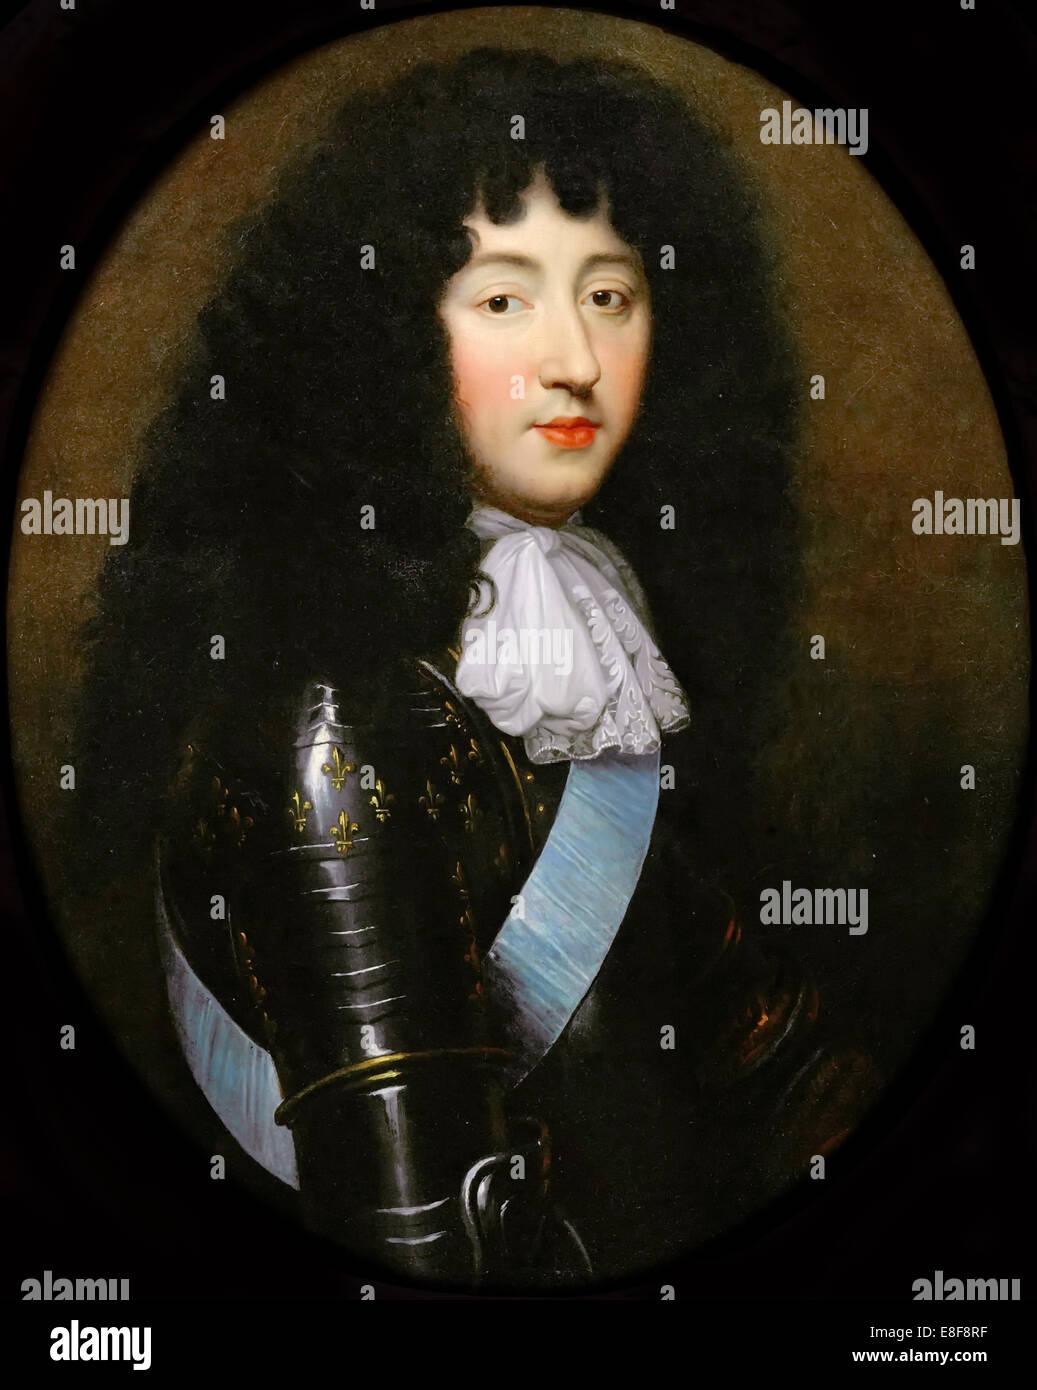 Philippe I, Duke of Orléans (1640-1701). Artist: Mignard, Pierre (1612-1695) - Stock Image